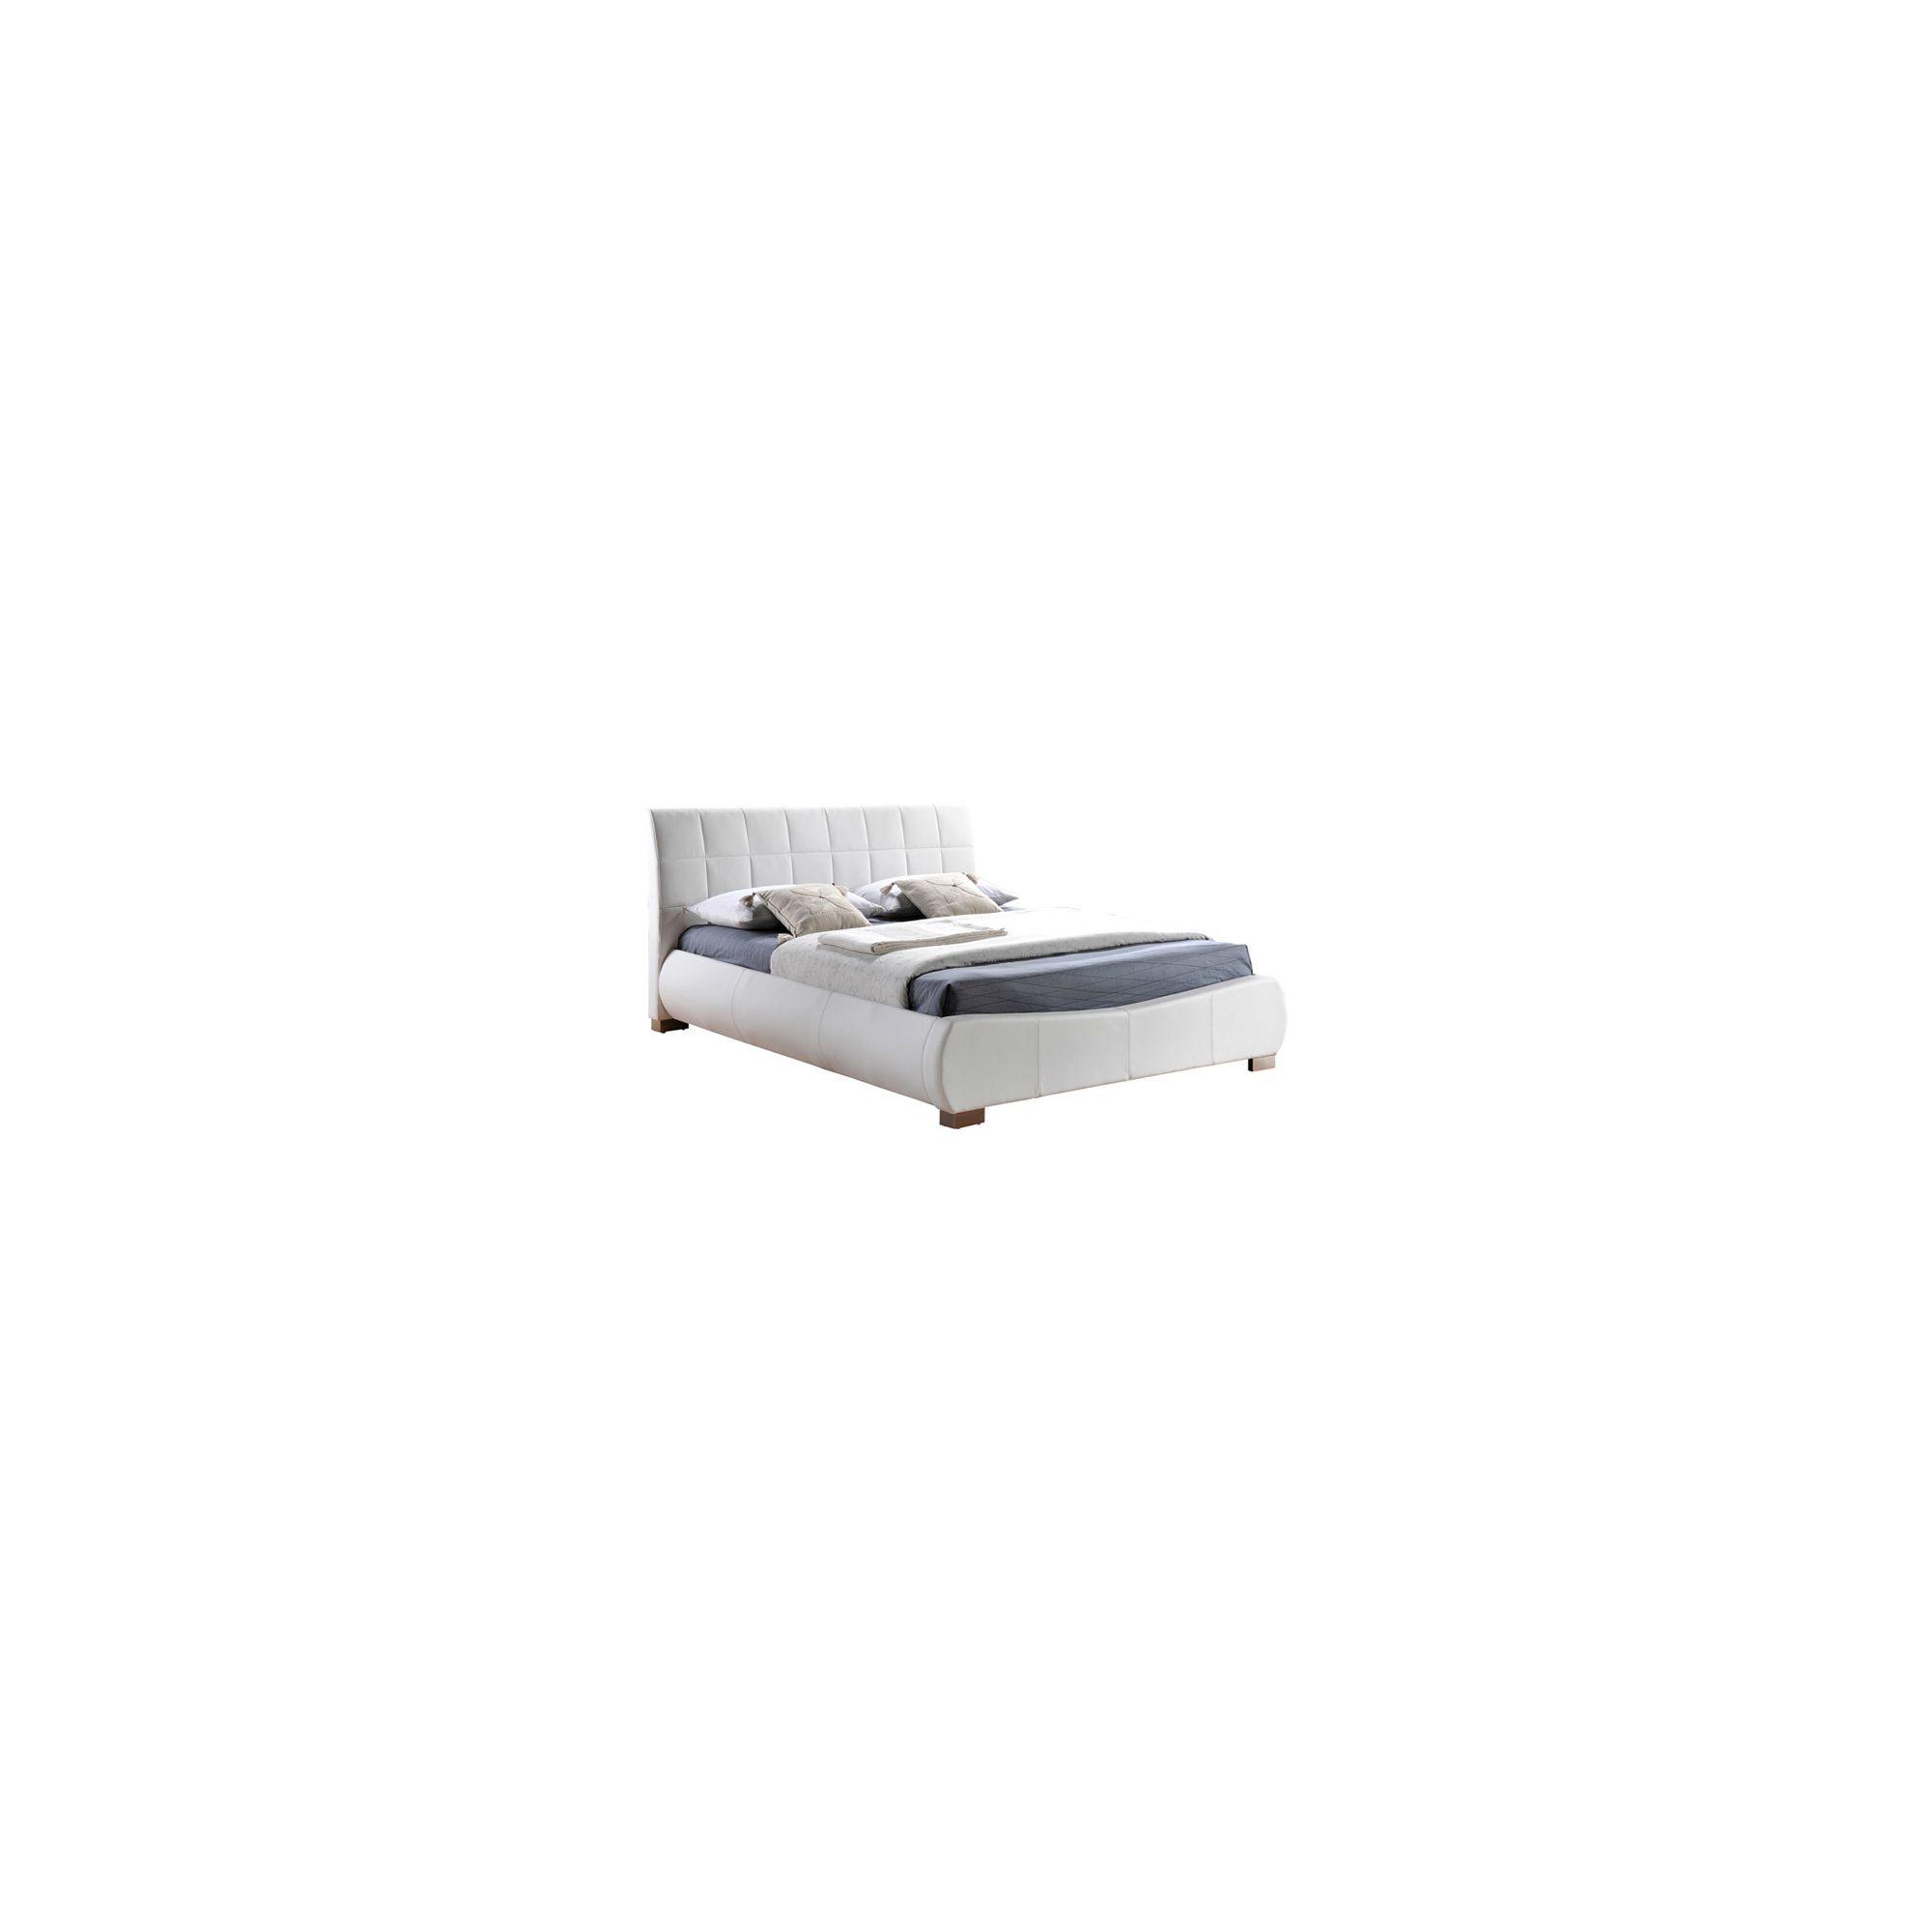 Limelight Dorado Bed Frame - Double - White at Tesco Direct